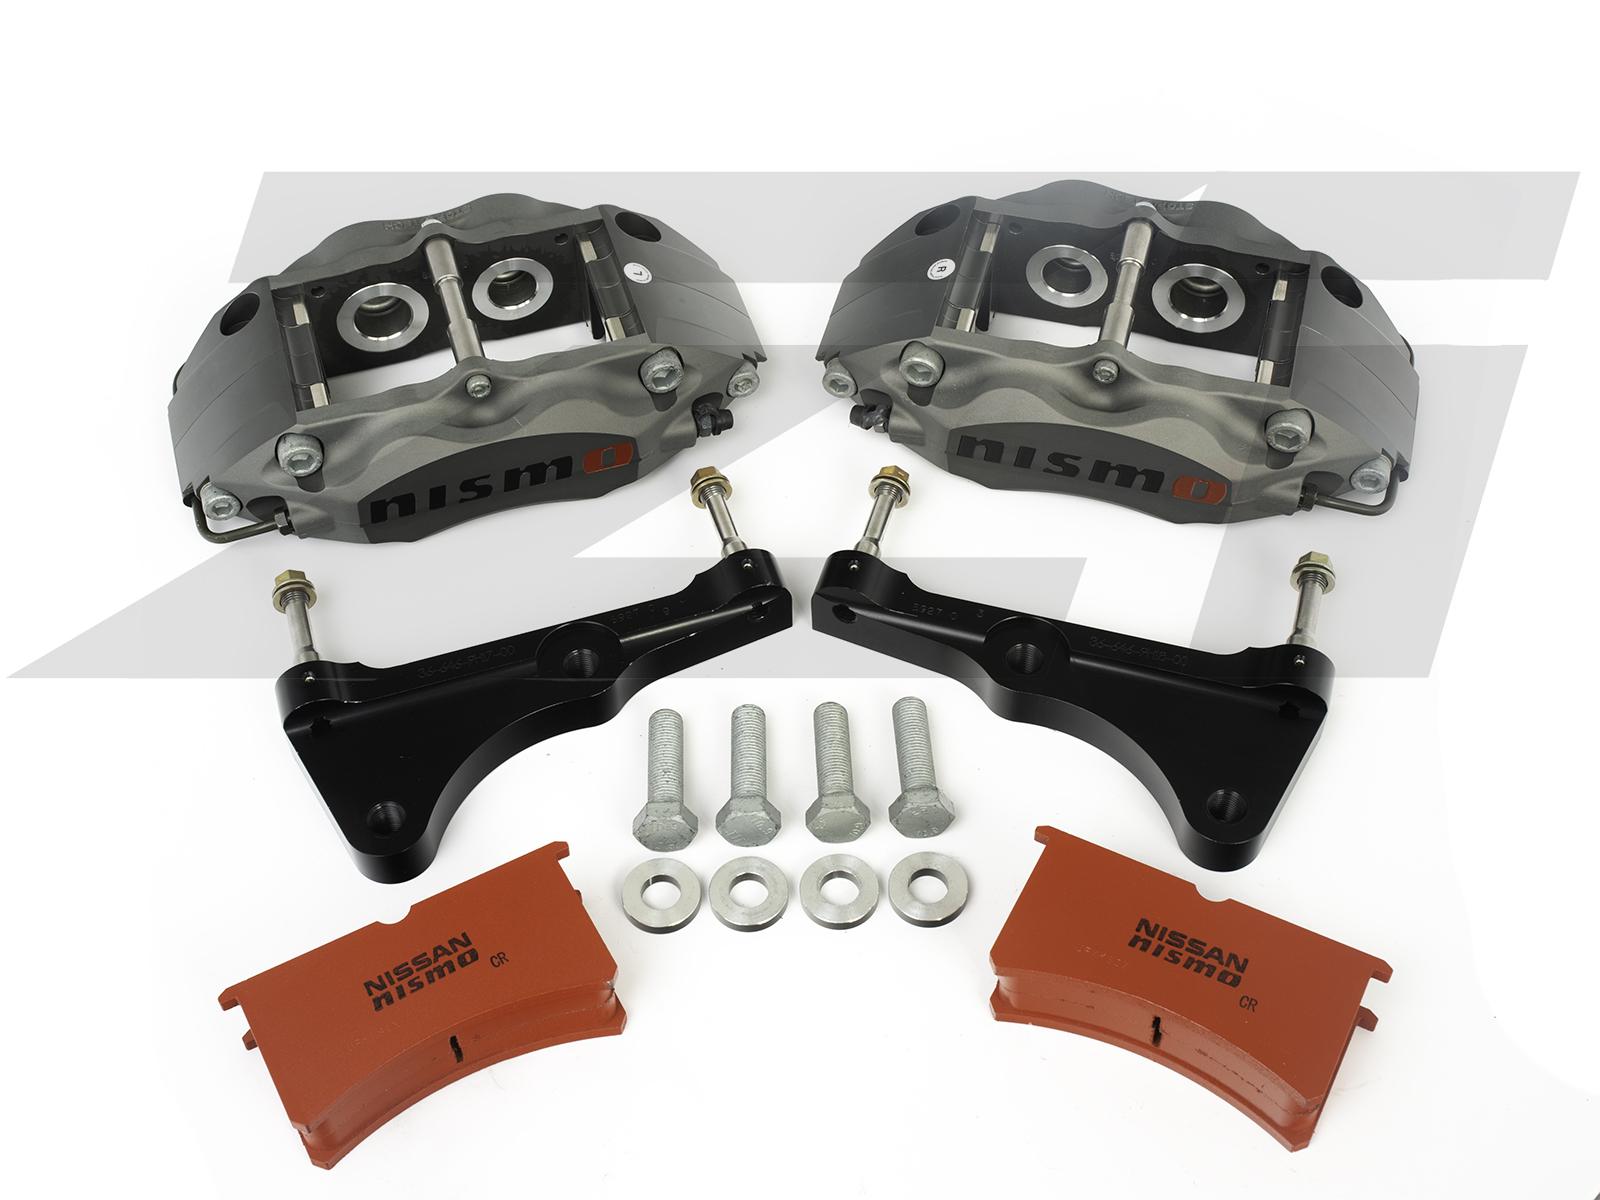 NISMO 350Z / G35 Stoptech RACE Front Brake Caliper Upgrade Kit